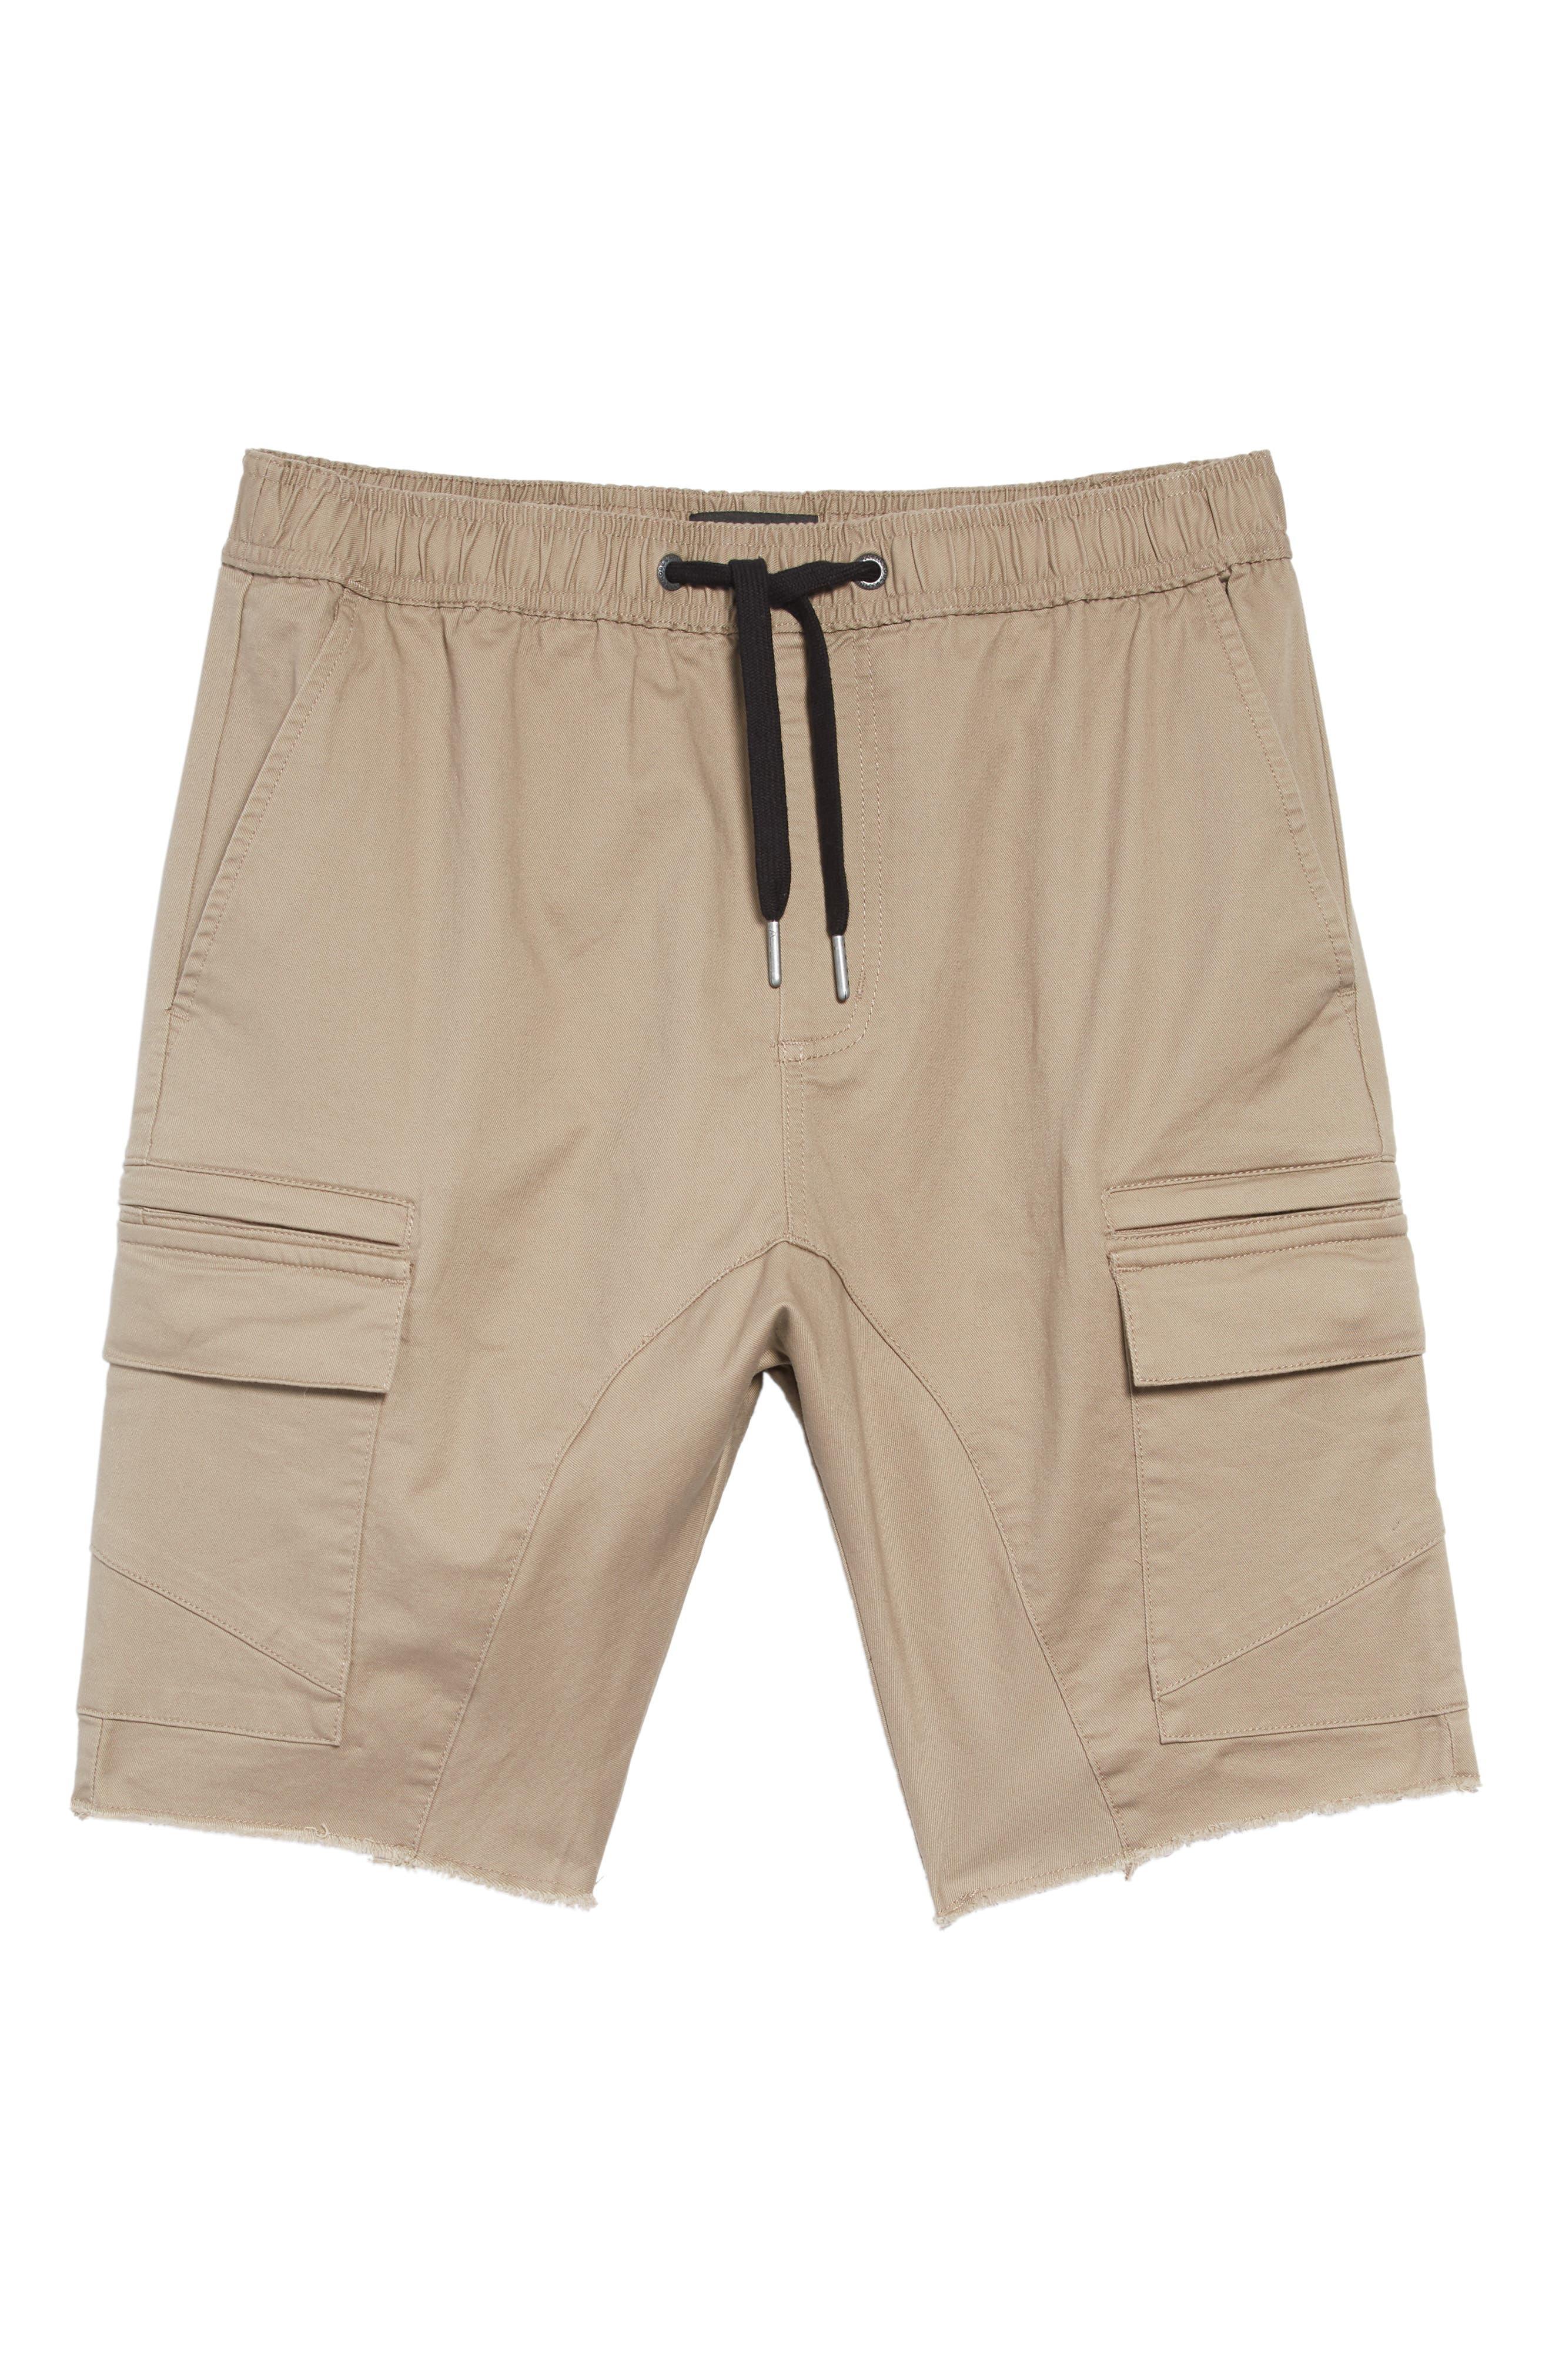 Sureshot Cargo Shorts,                             Alternate thumbnail 4, color,                             SAND